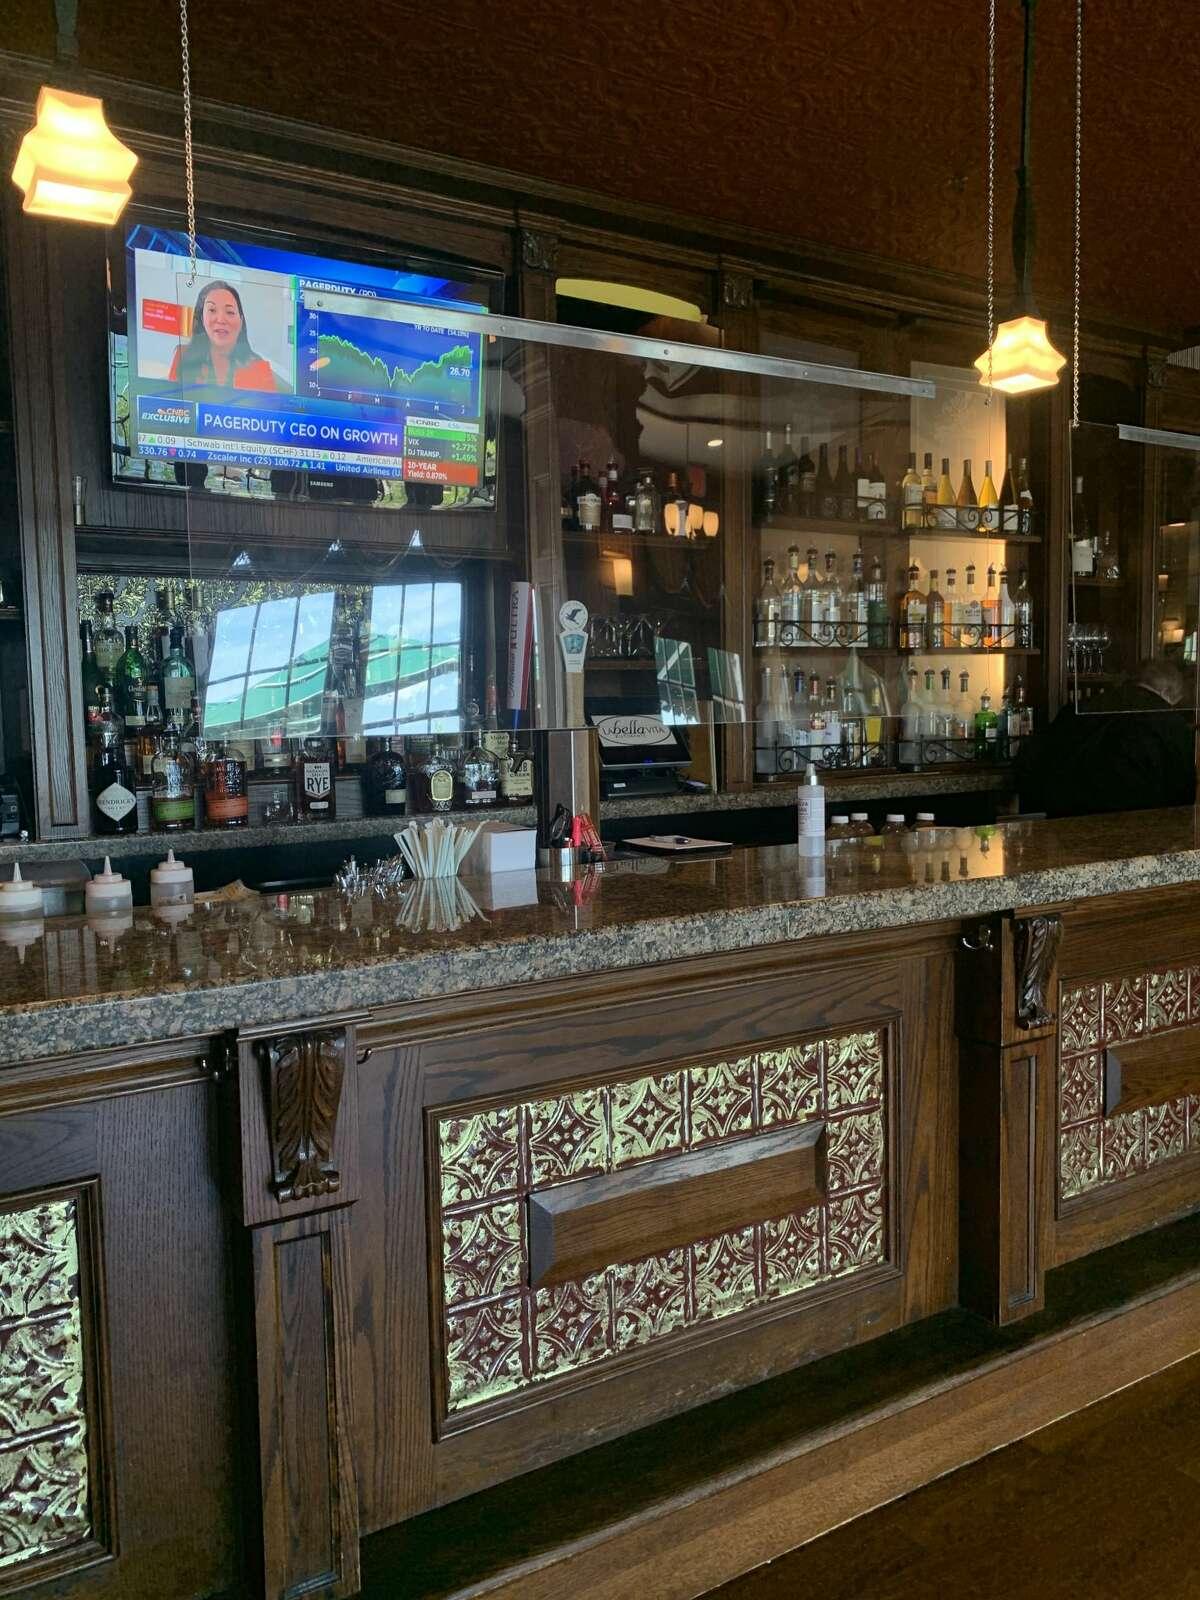 Plexiglass at the bar of The Sagamore.